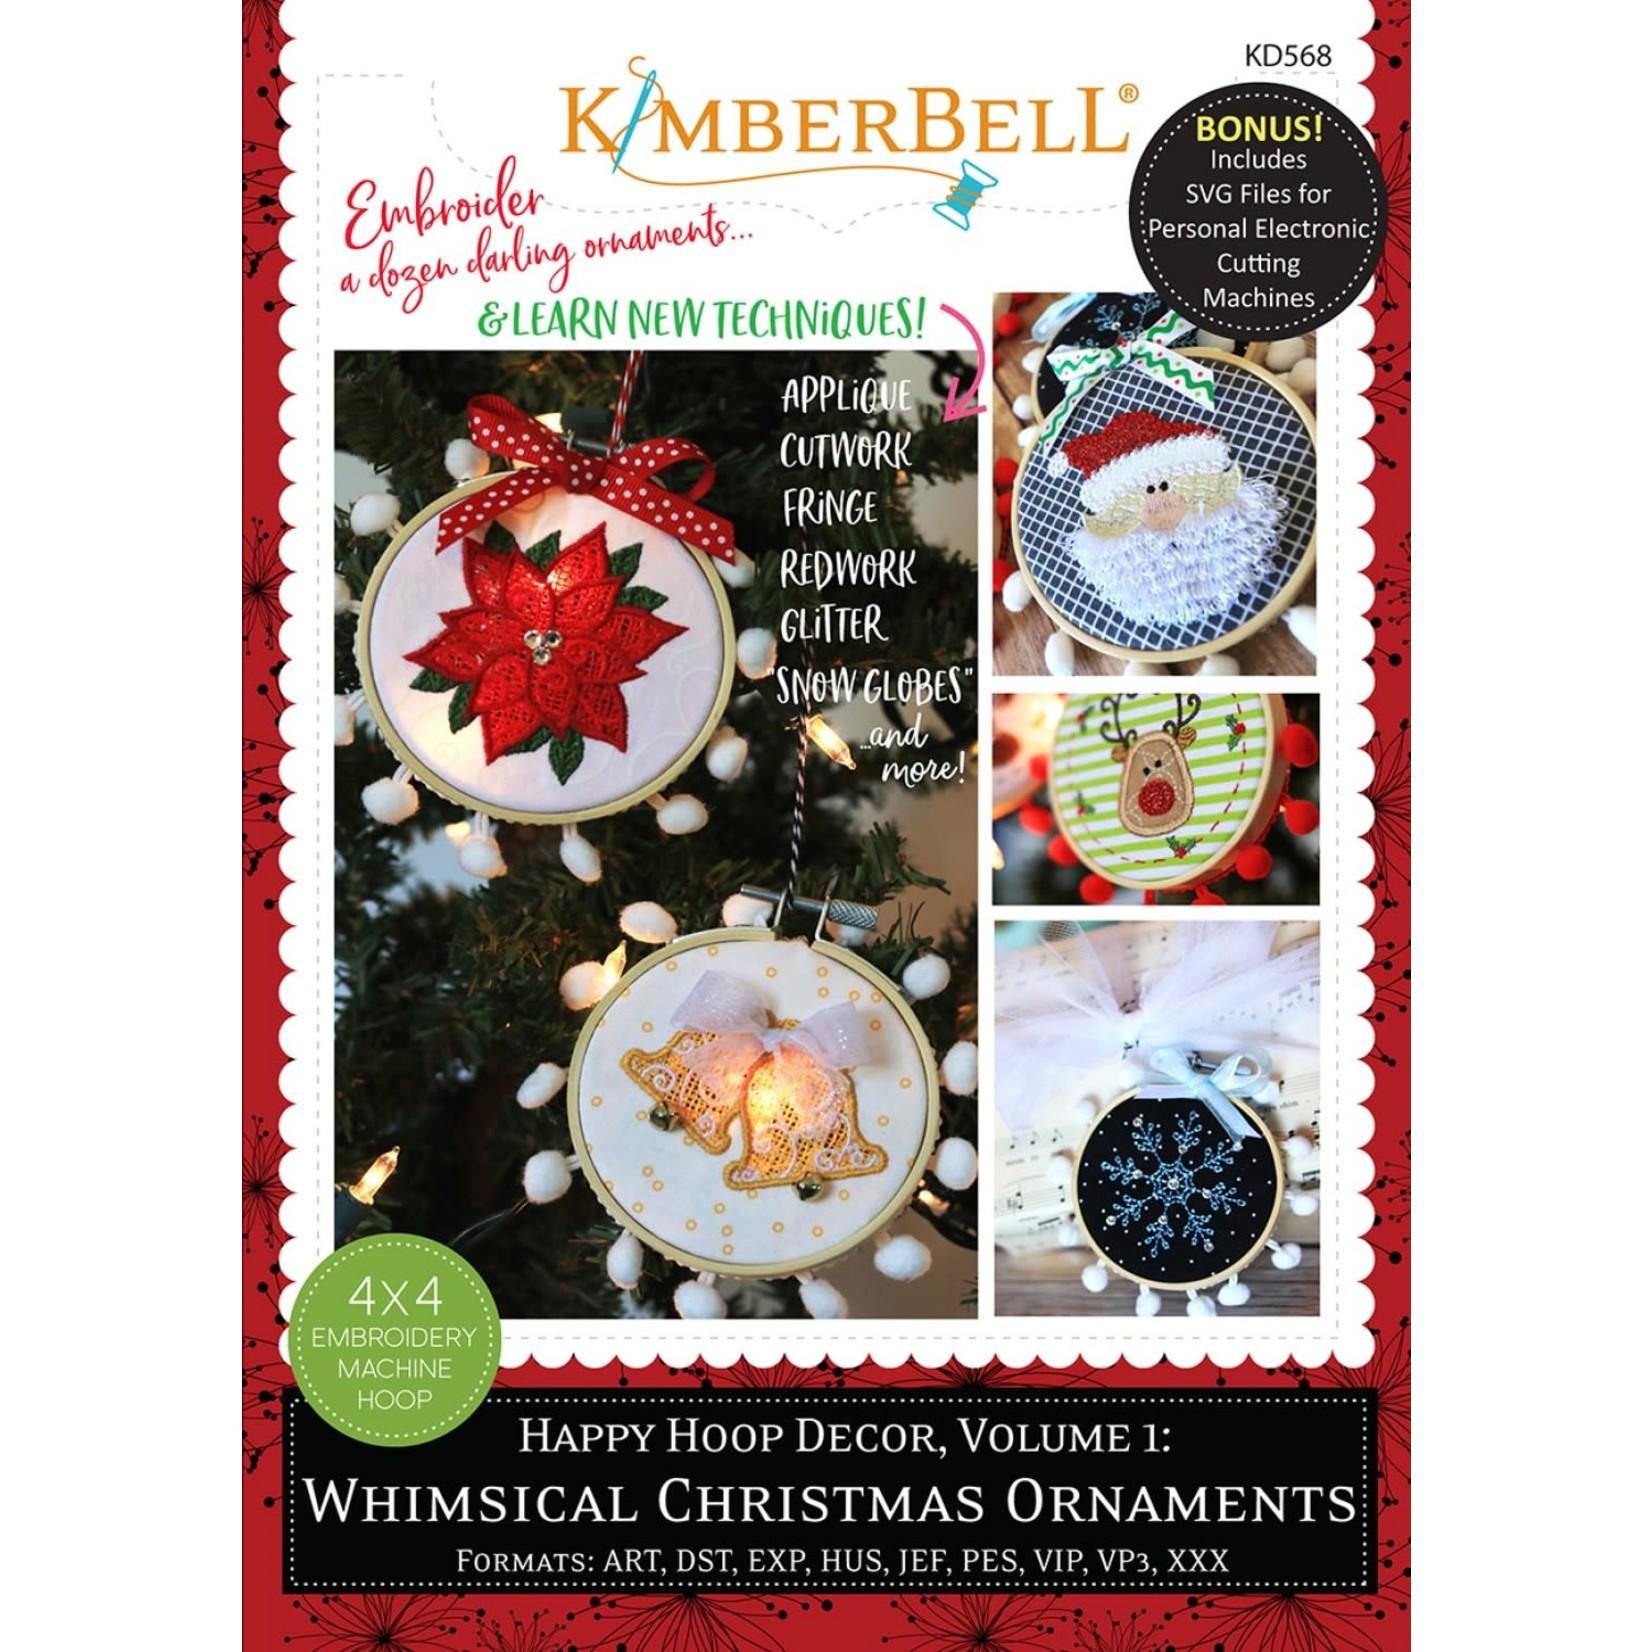 KIMBERBELL DESIGNS Happy Hoop Decor, Volume 1: Whimsical Christmas Ornaments